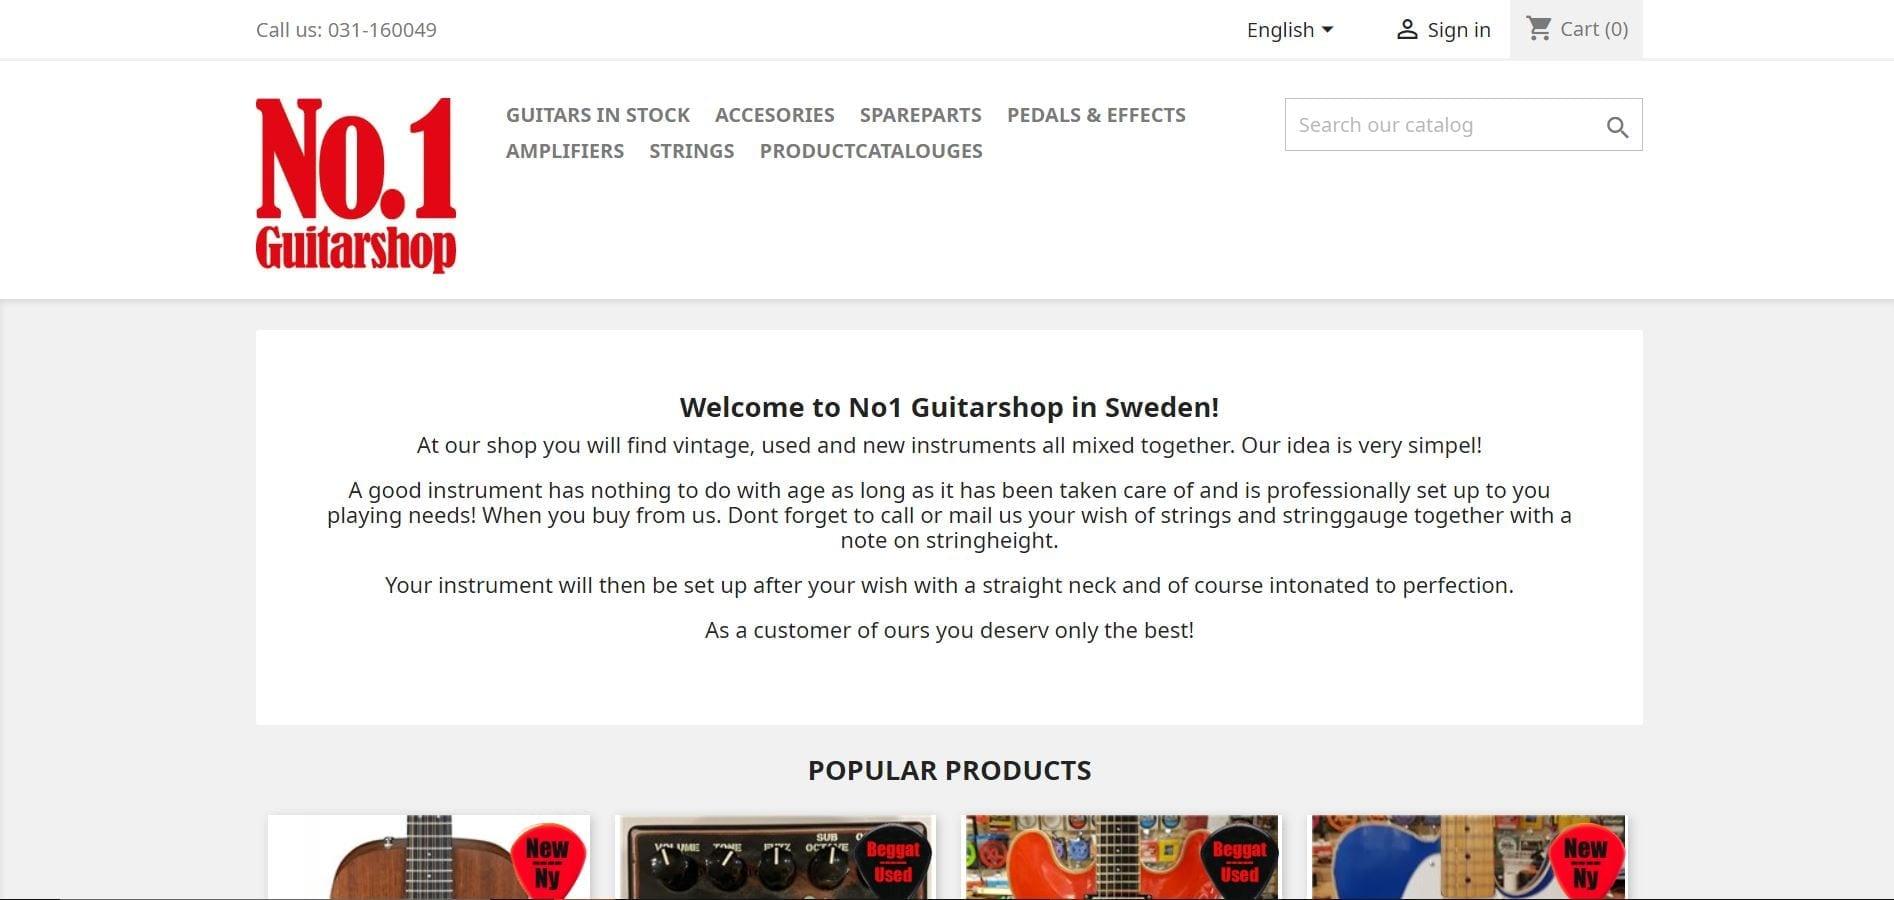 No1GuitarShop website landing page